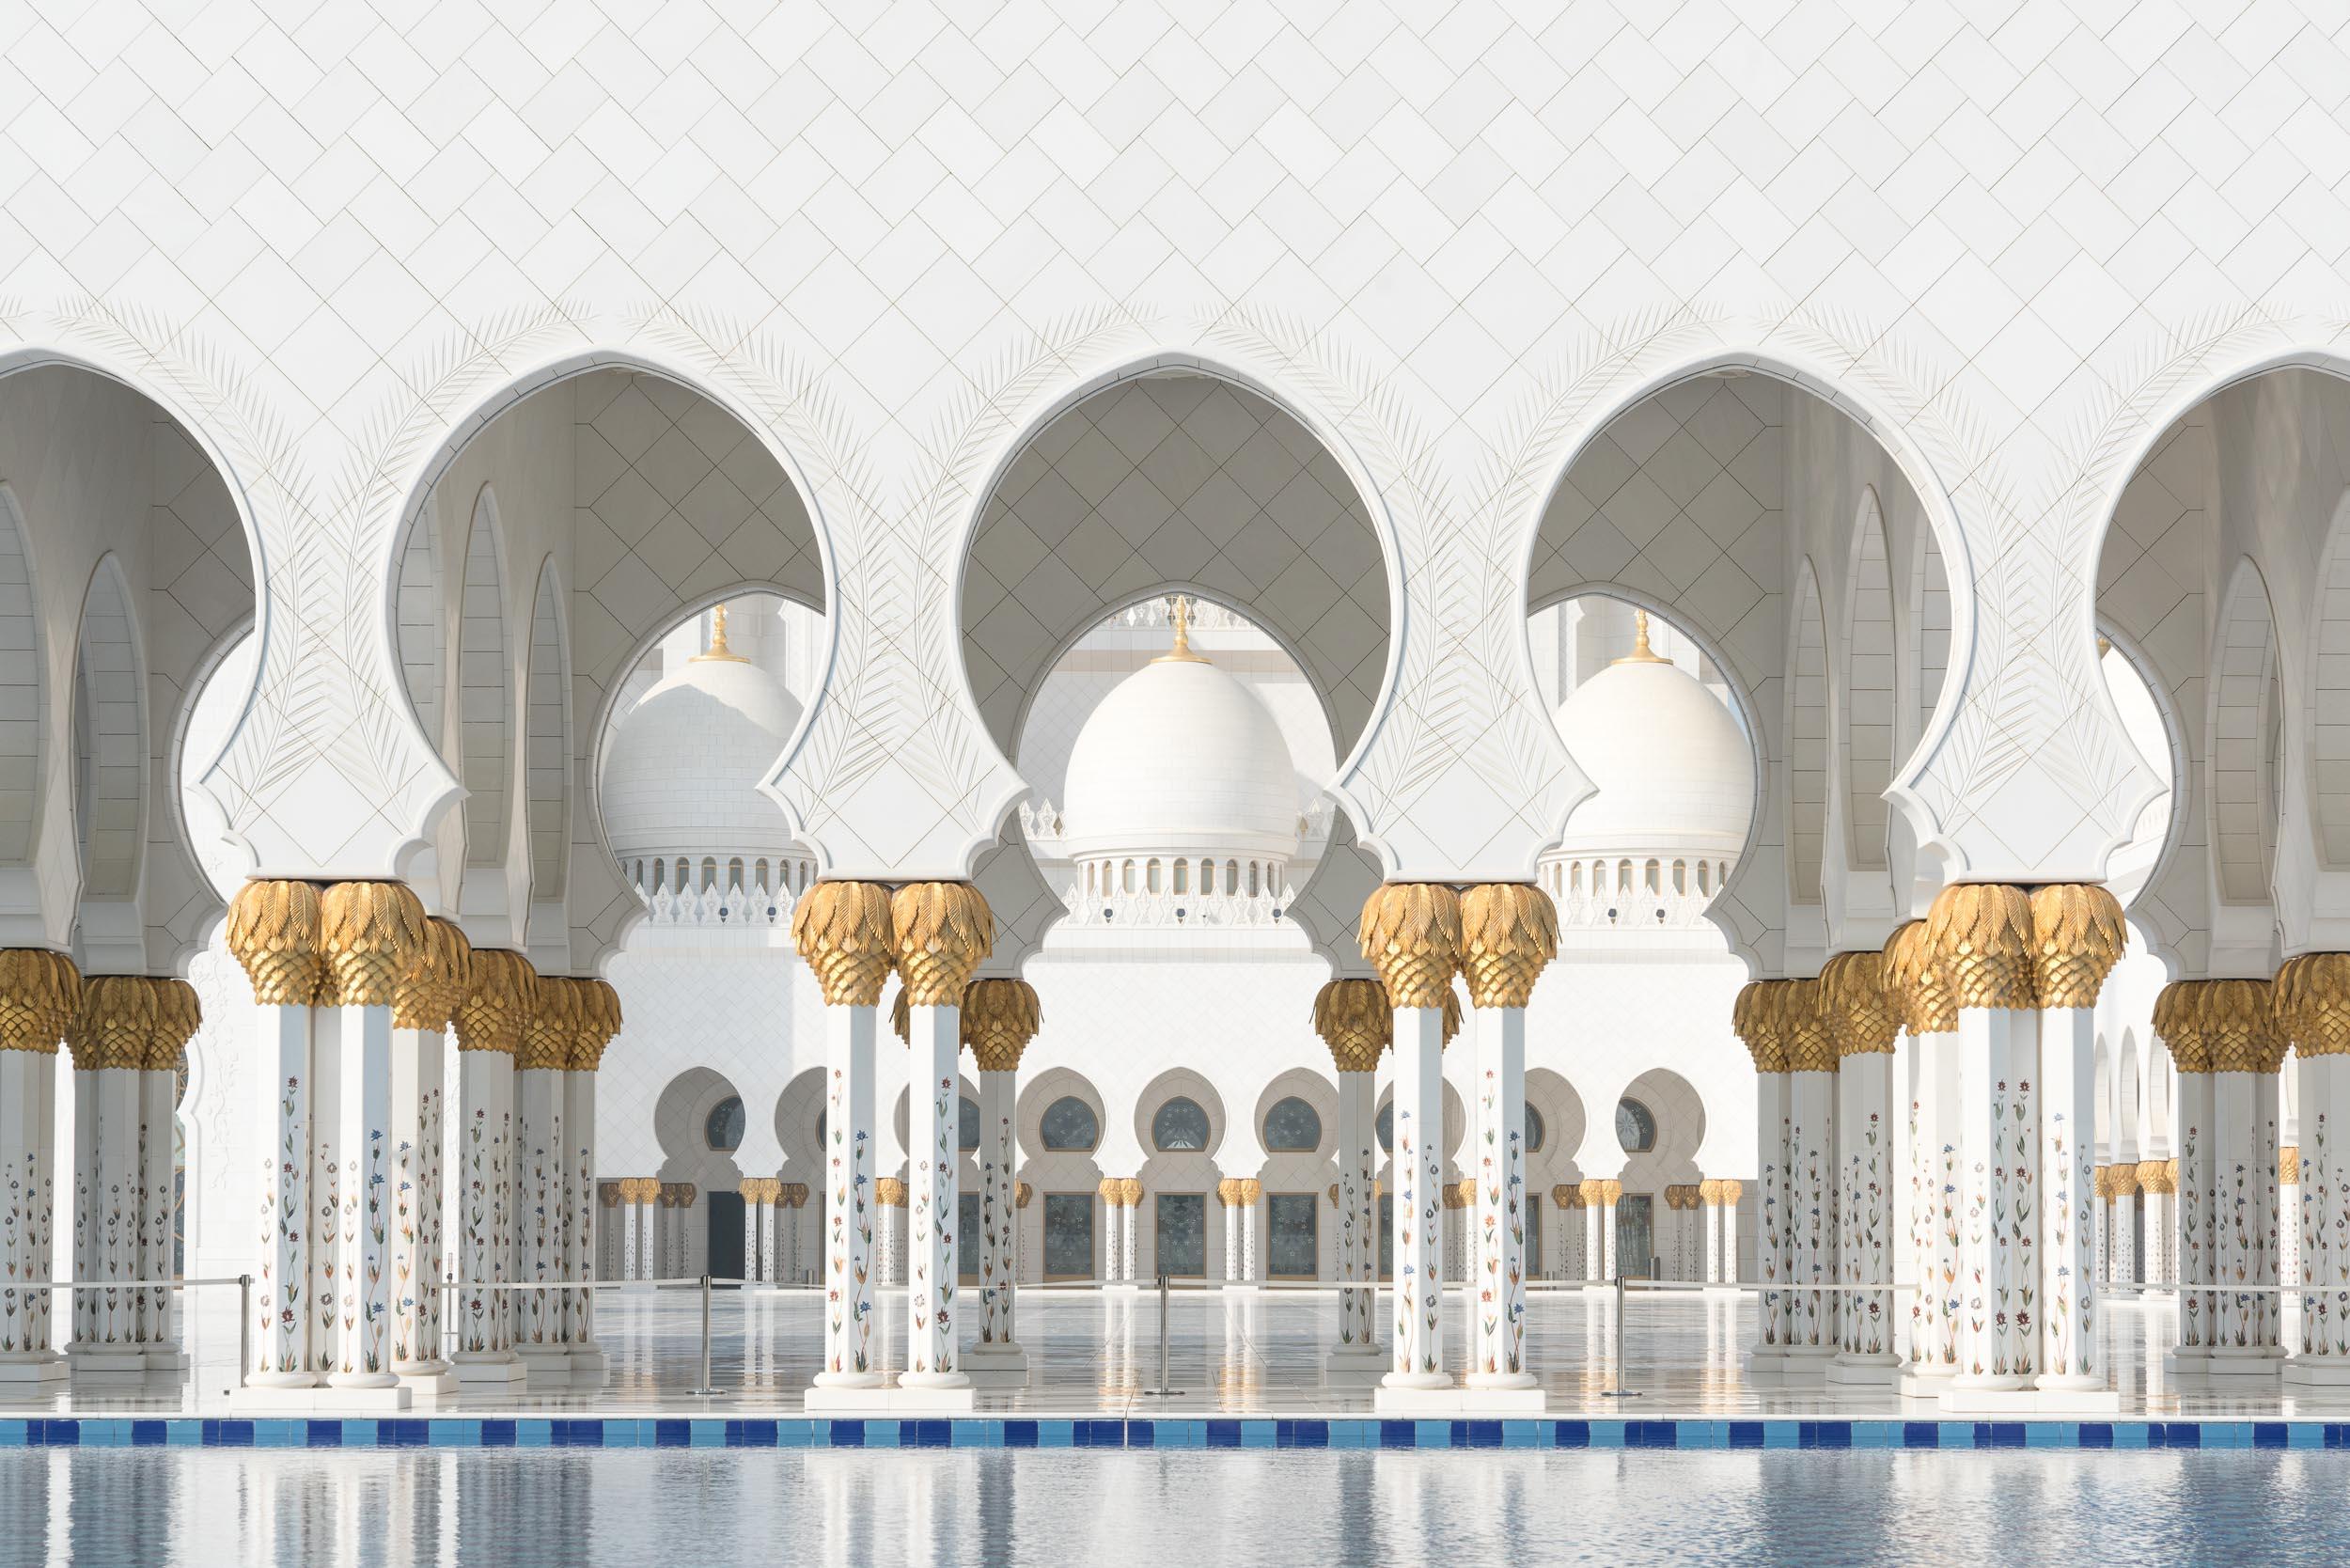 the_getaway_edit_abu_dhabi_sheikh_zayed_grand_mosque-1.jpg